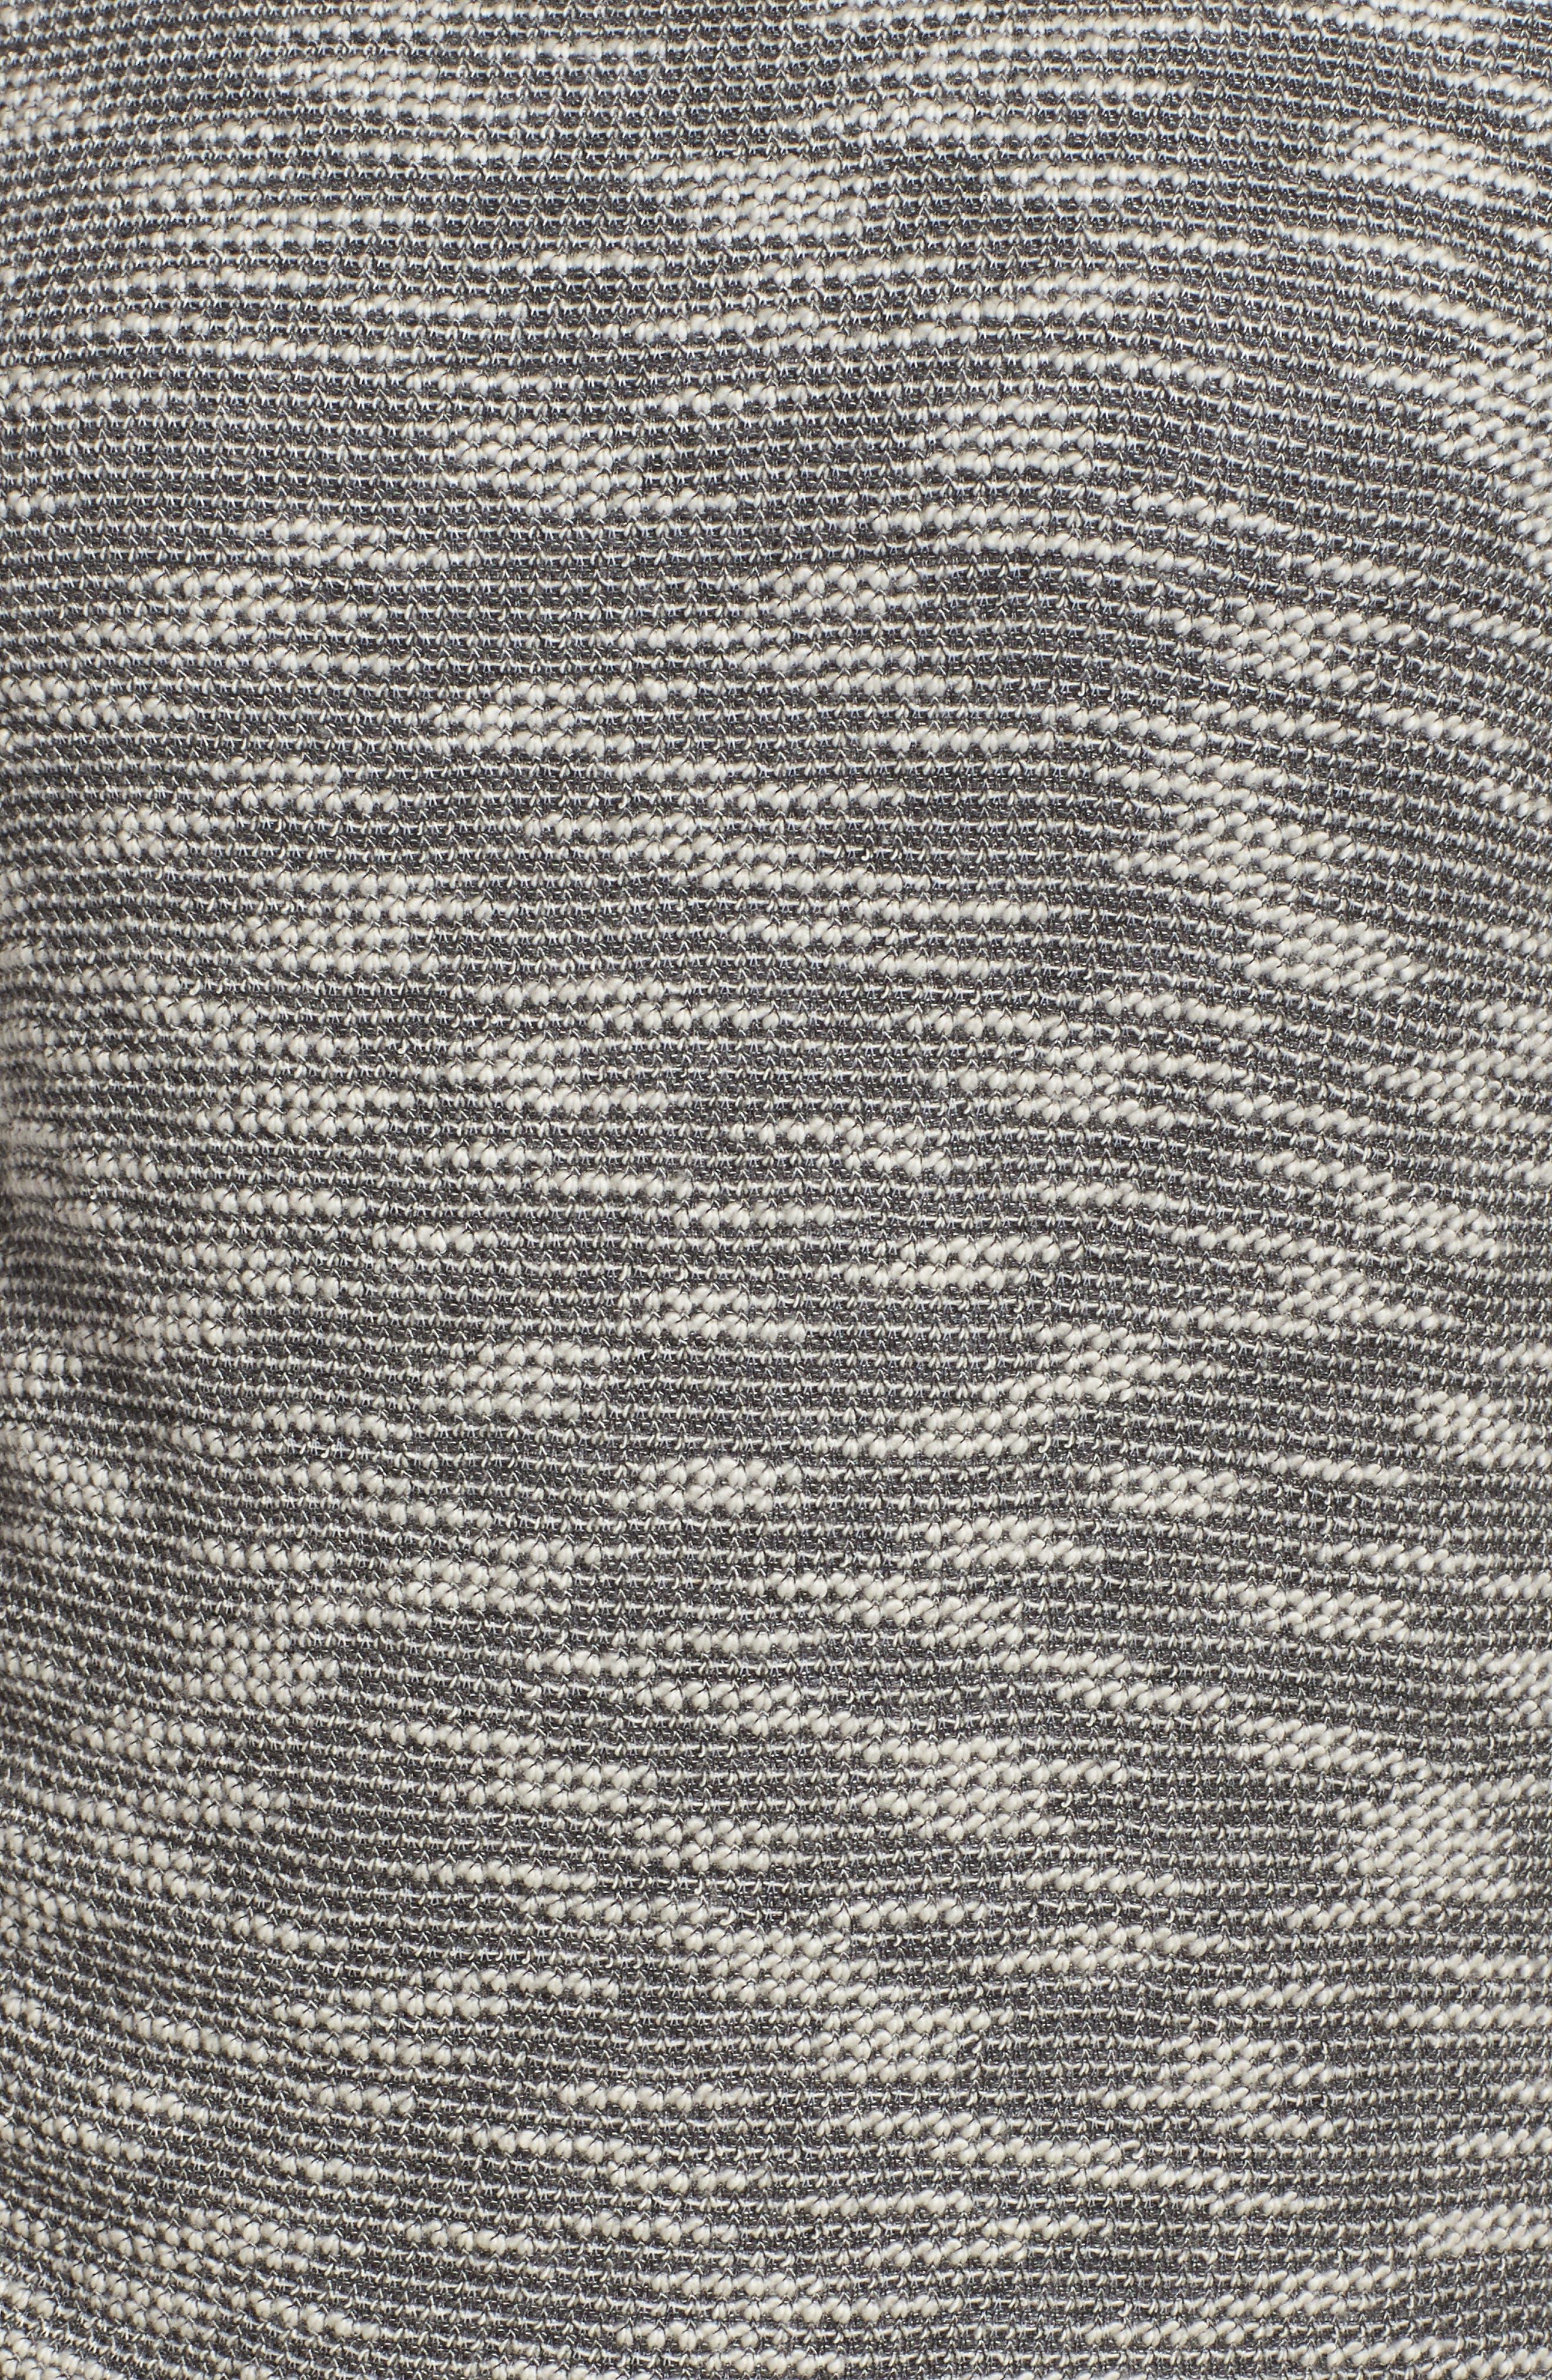 Sophia Long Sleeve Tee,                             Alternate thumbnail 7, color,                             Gravel